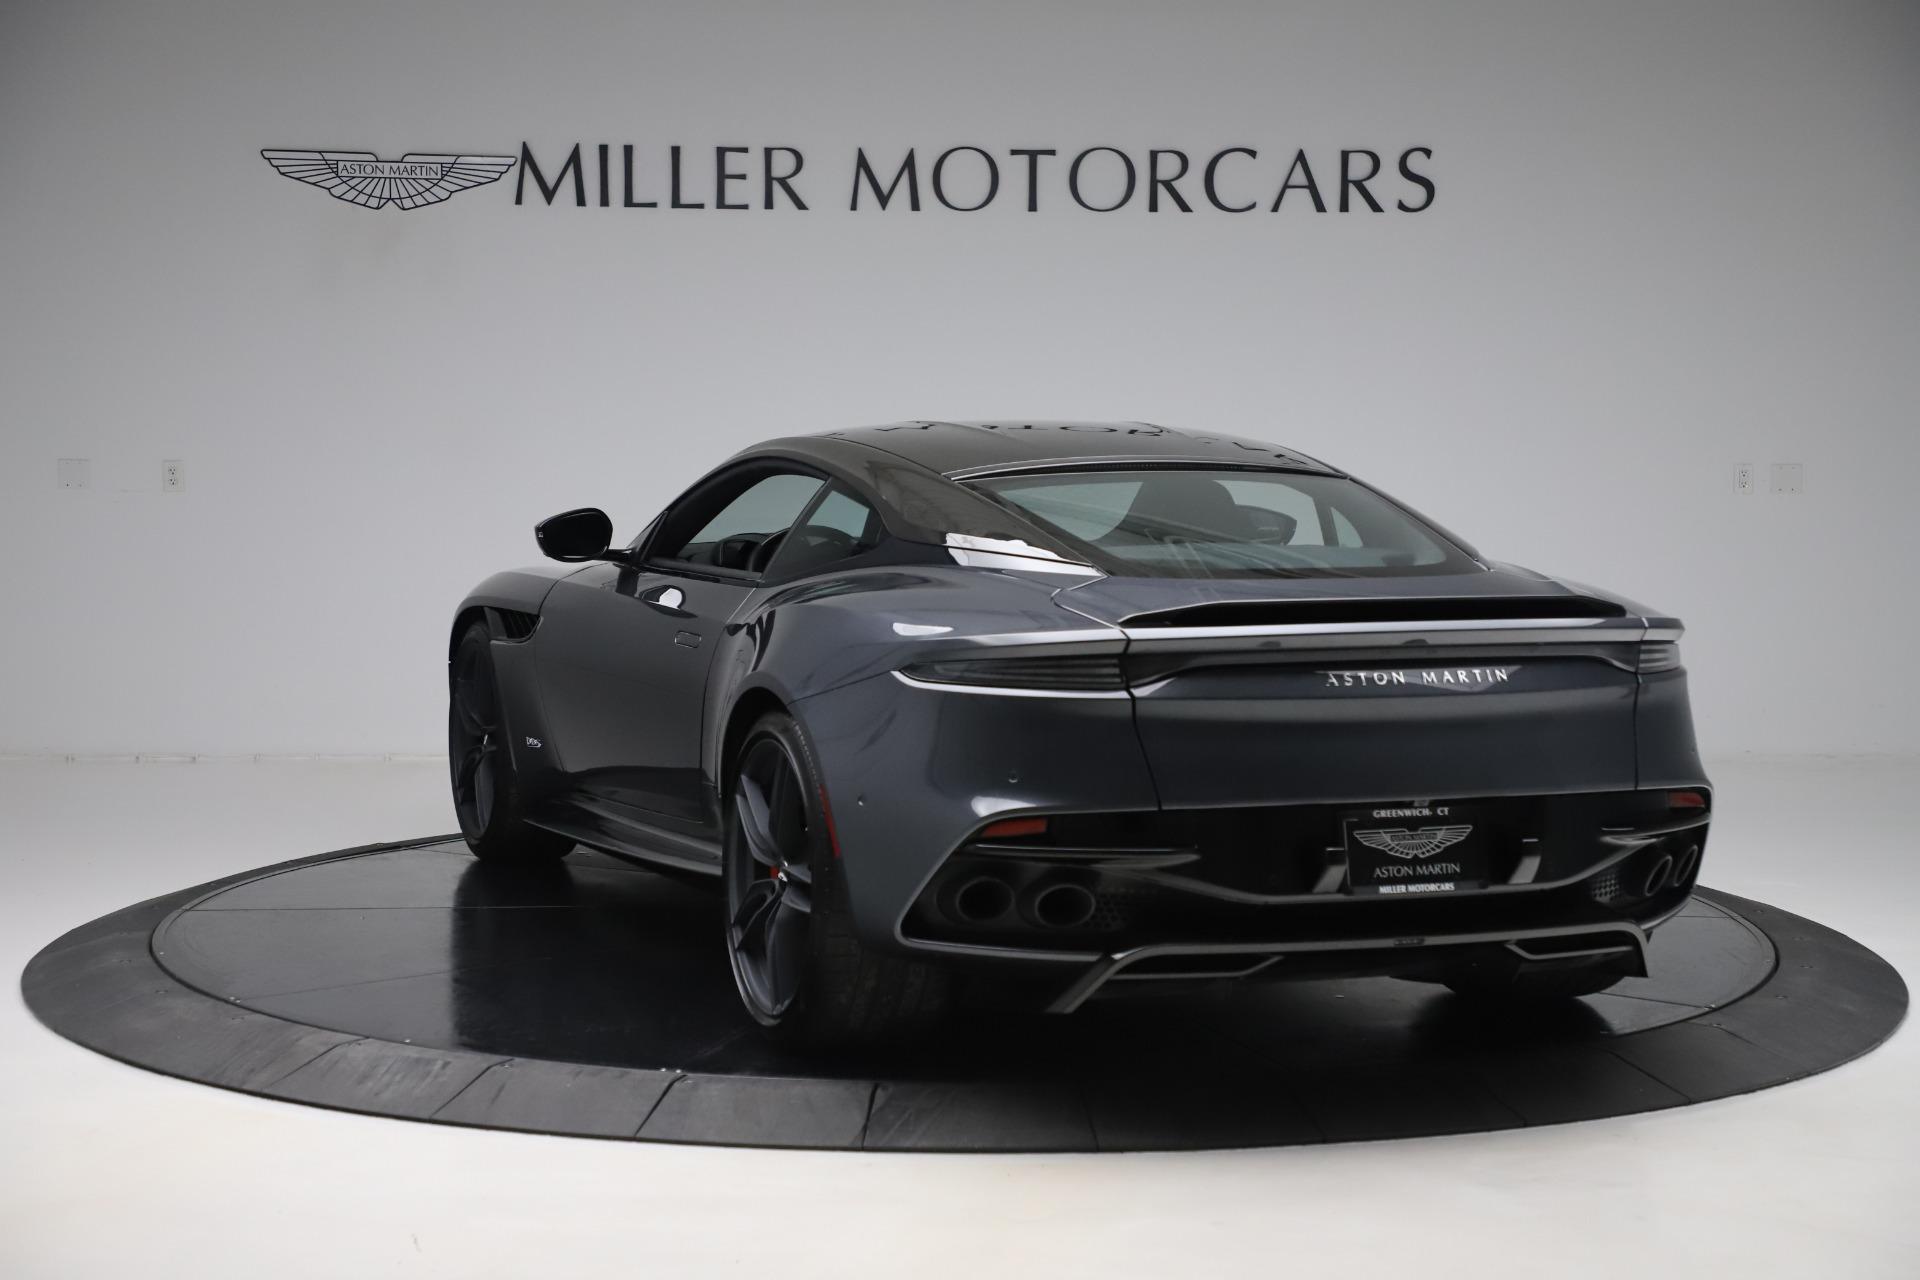 Used 2019 Aston Martin DBS Superleggera Coupe For Sale In Greenwich, CT. Alfa Romeo of Greenwich, A1438B 3570_p5